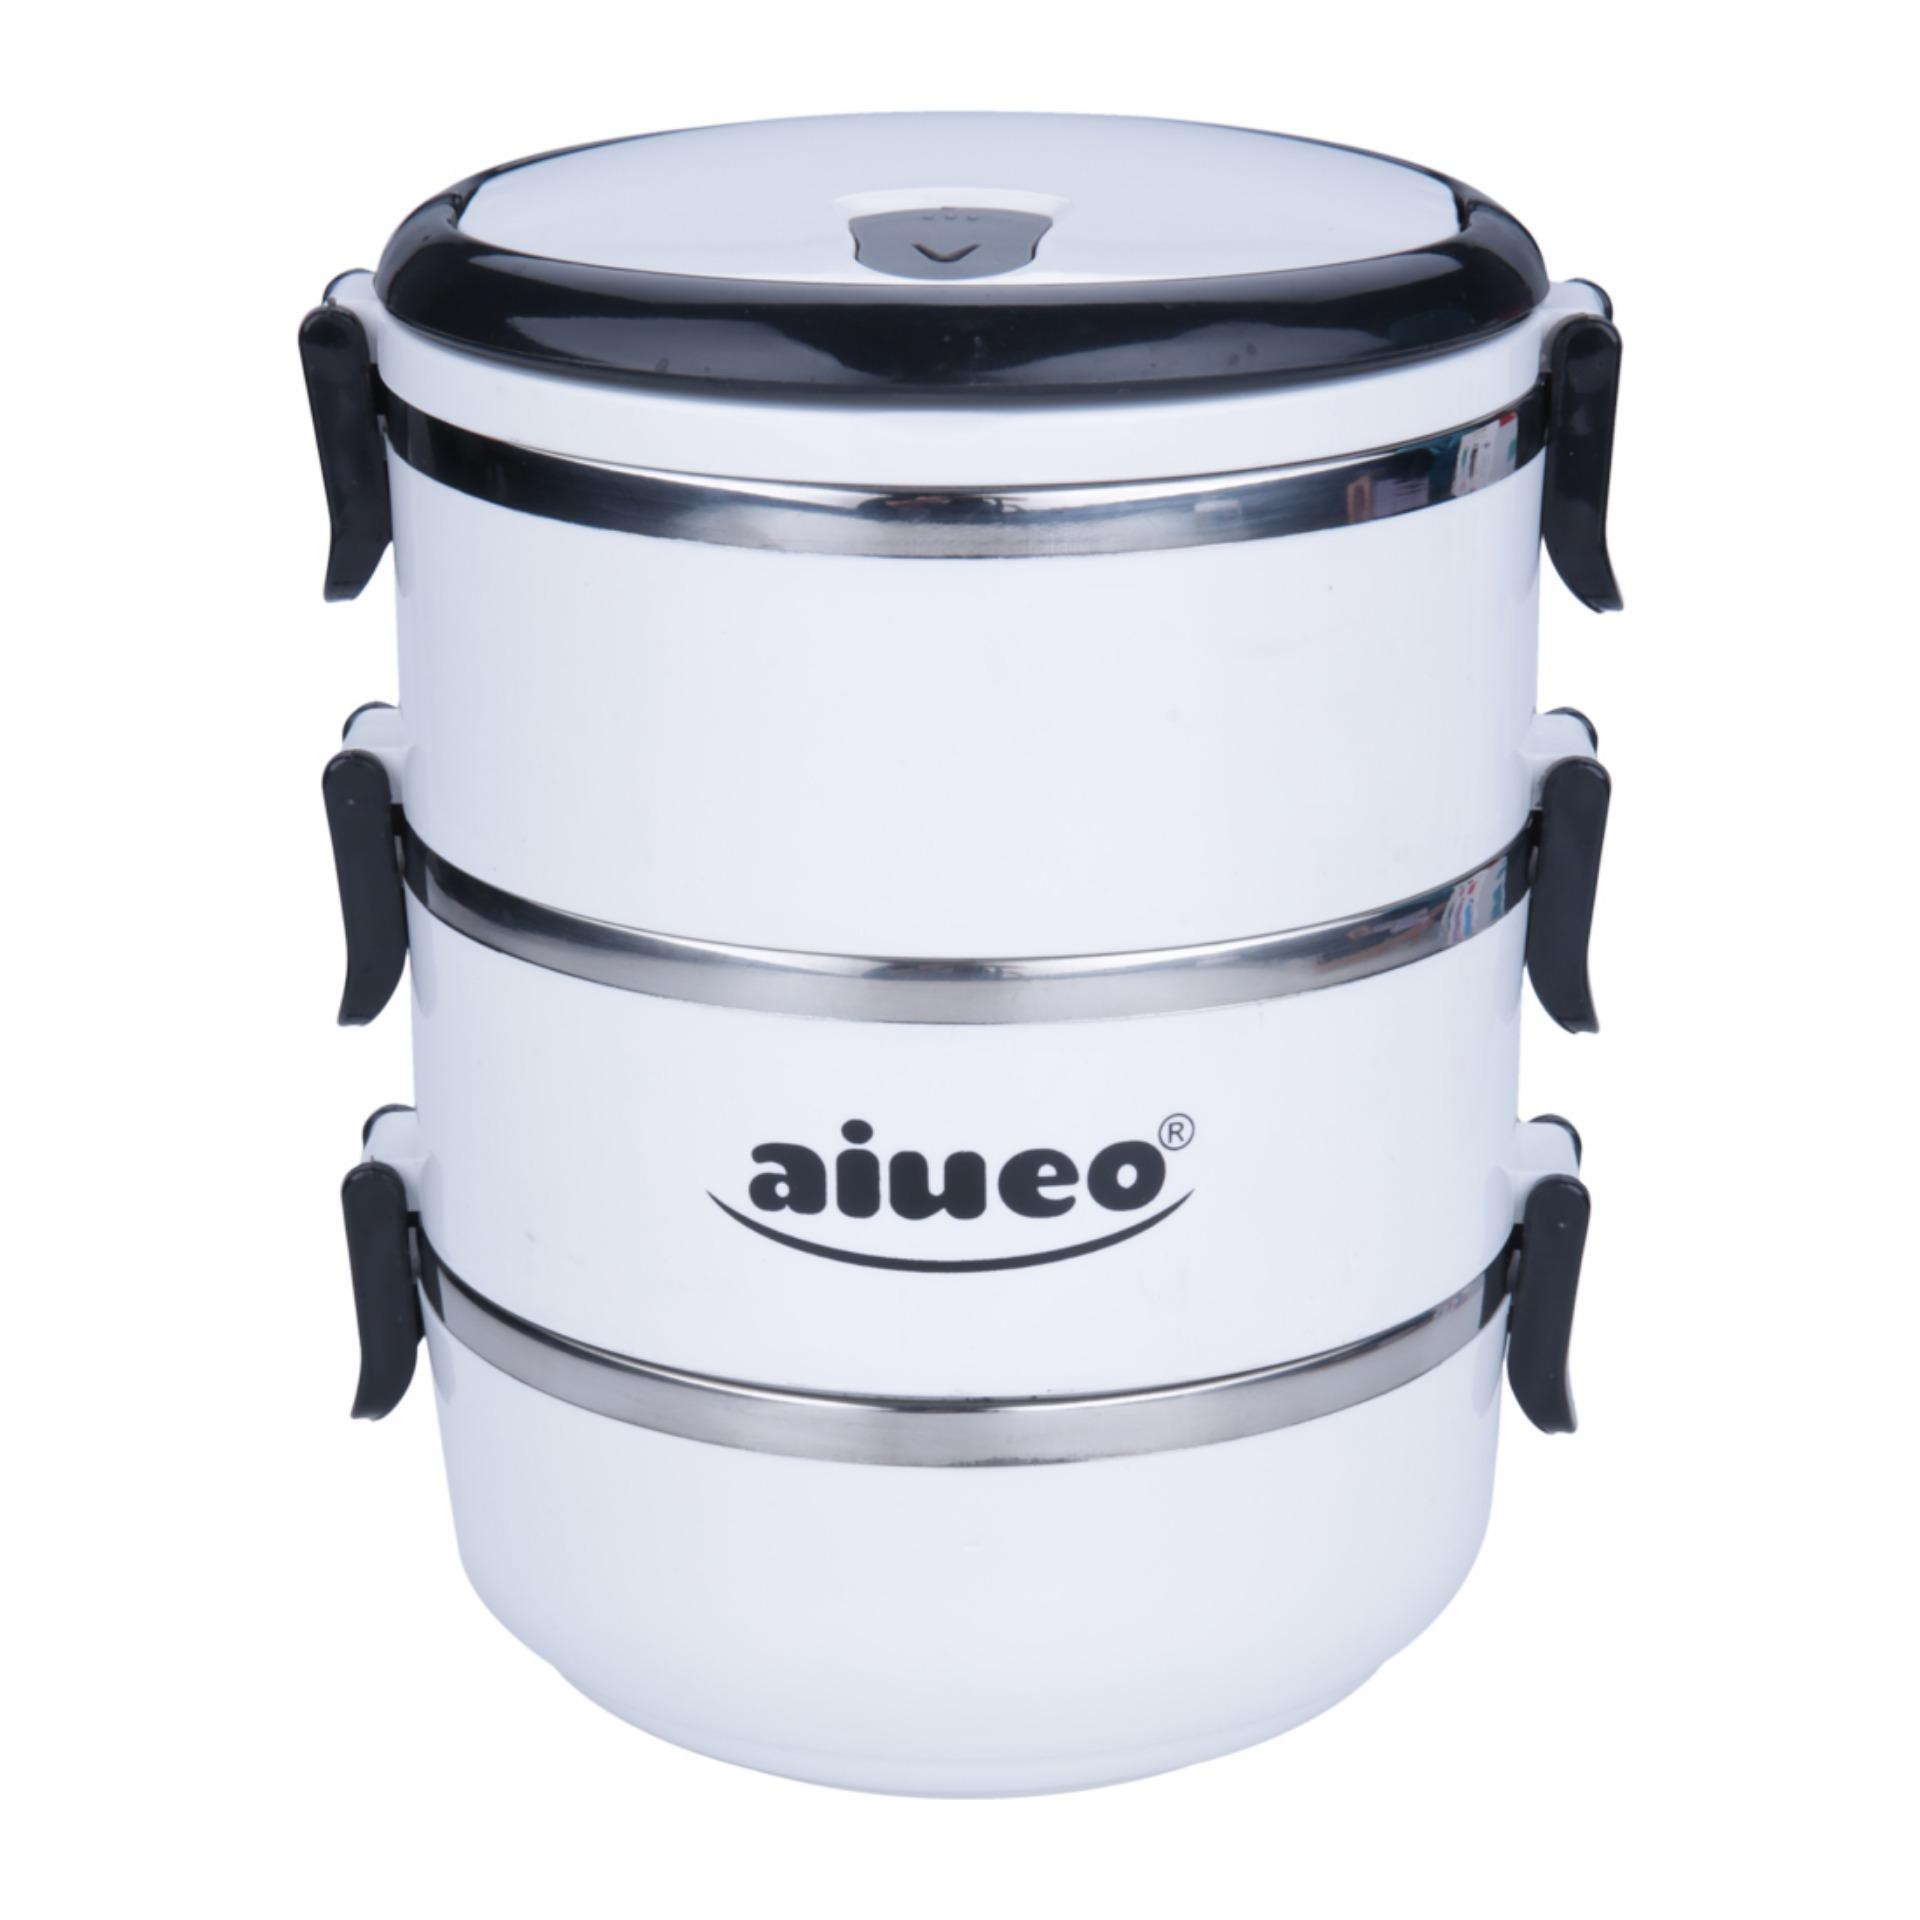 Kantung Makan Termurah Yooyee Lunch Box Kotak Sup Bento Hijau Aiueo Eco Stainless Steel Rantang 3 Susun Glossy